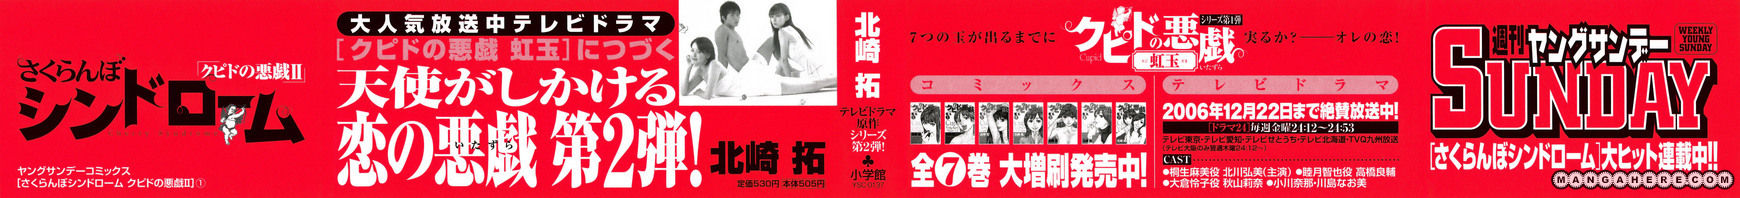 Sakuranbo Syndrome 1 Page 3